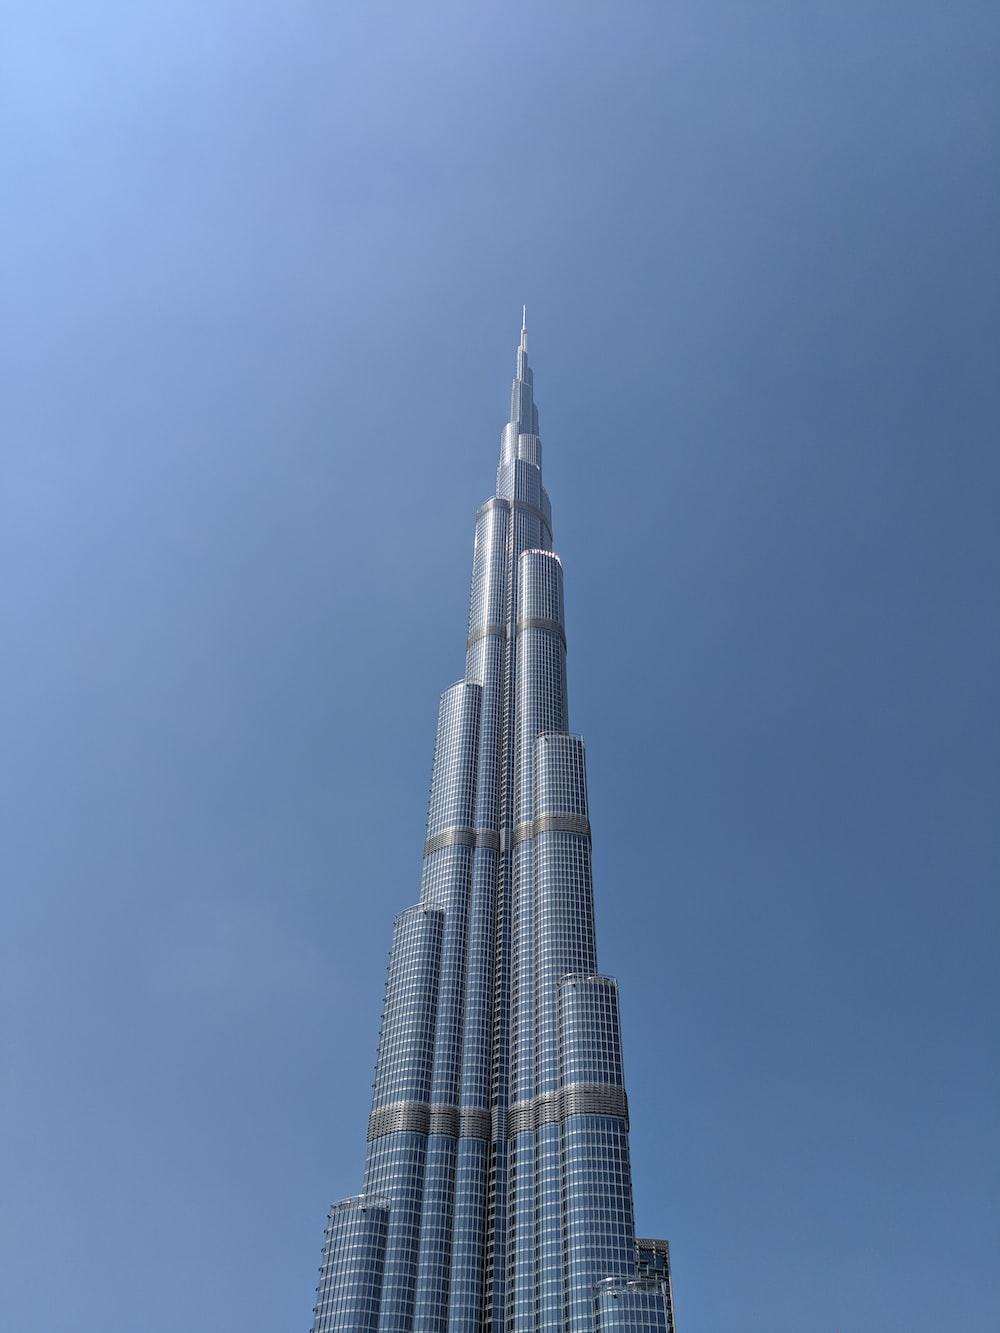 grey high rise tower